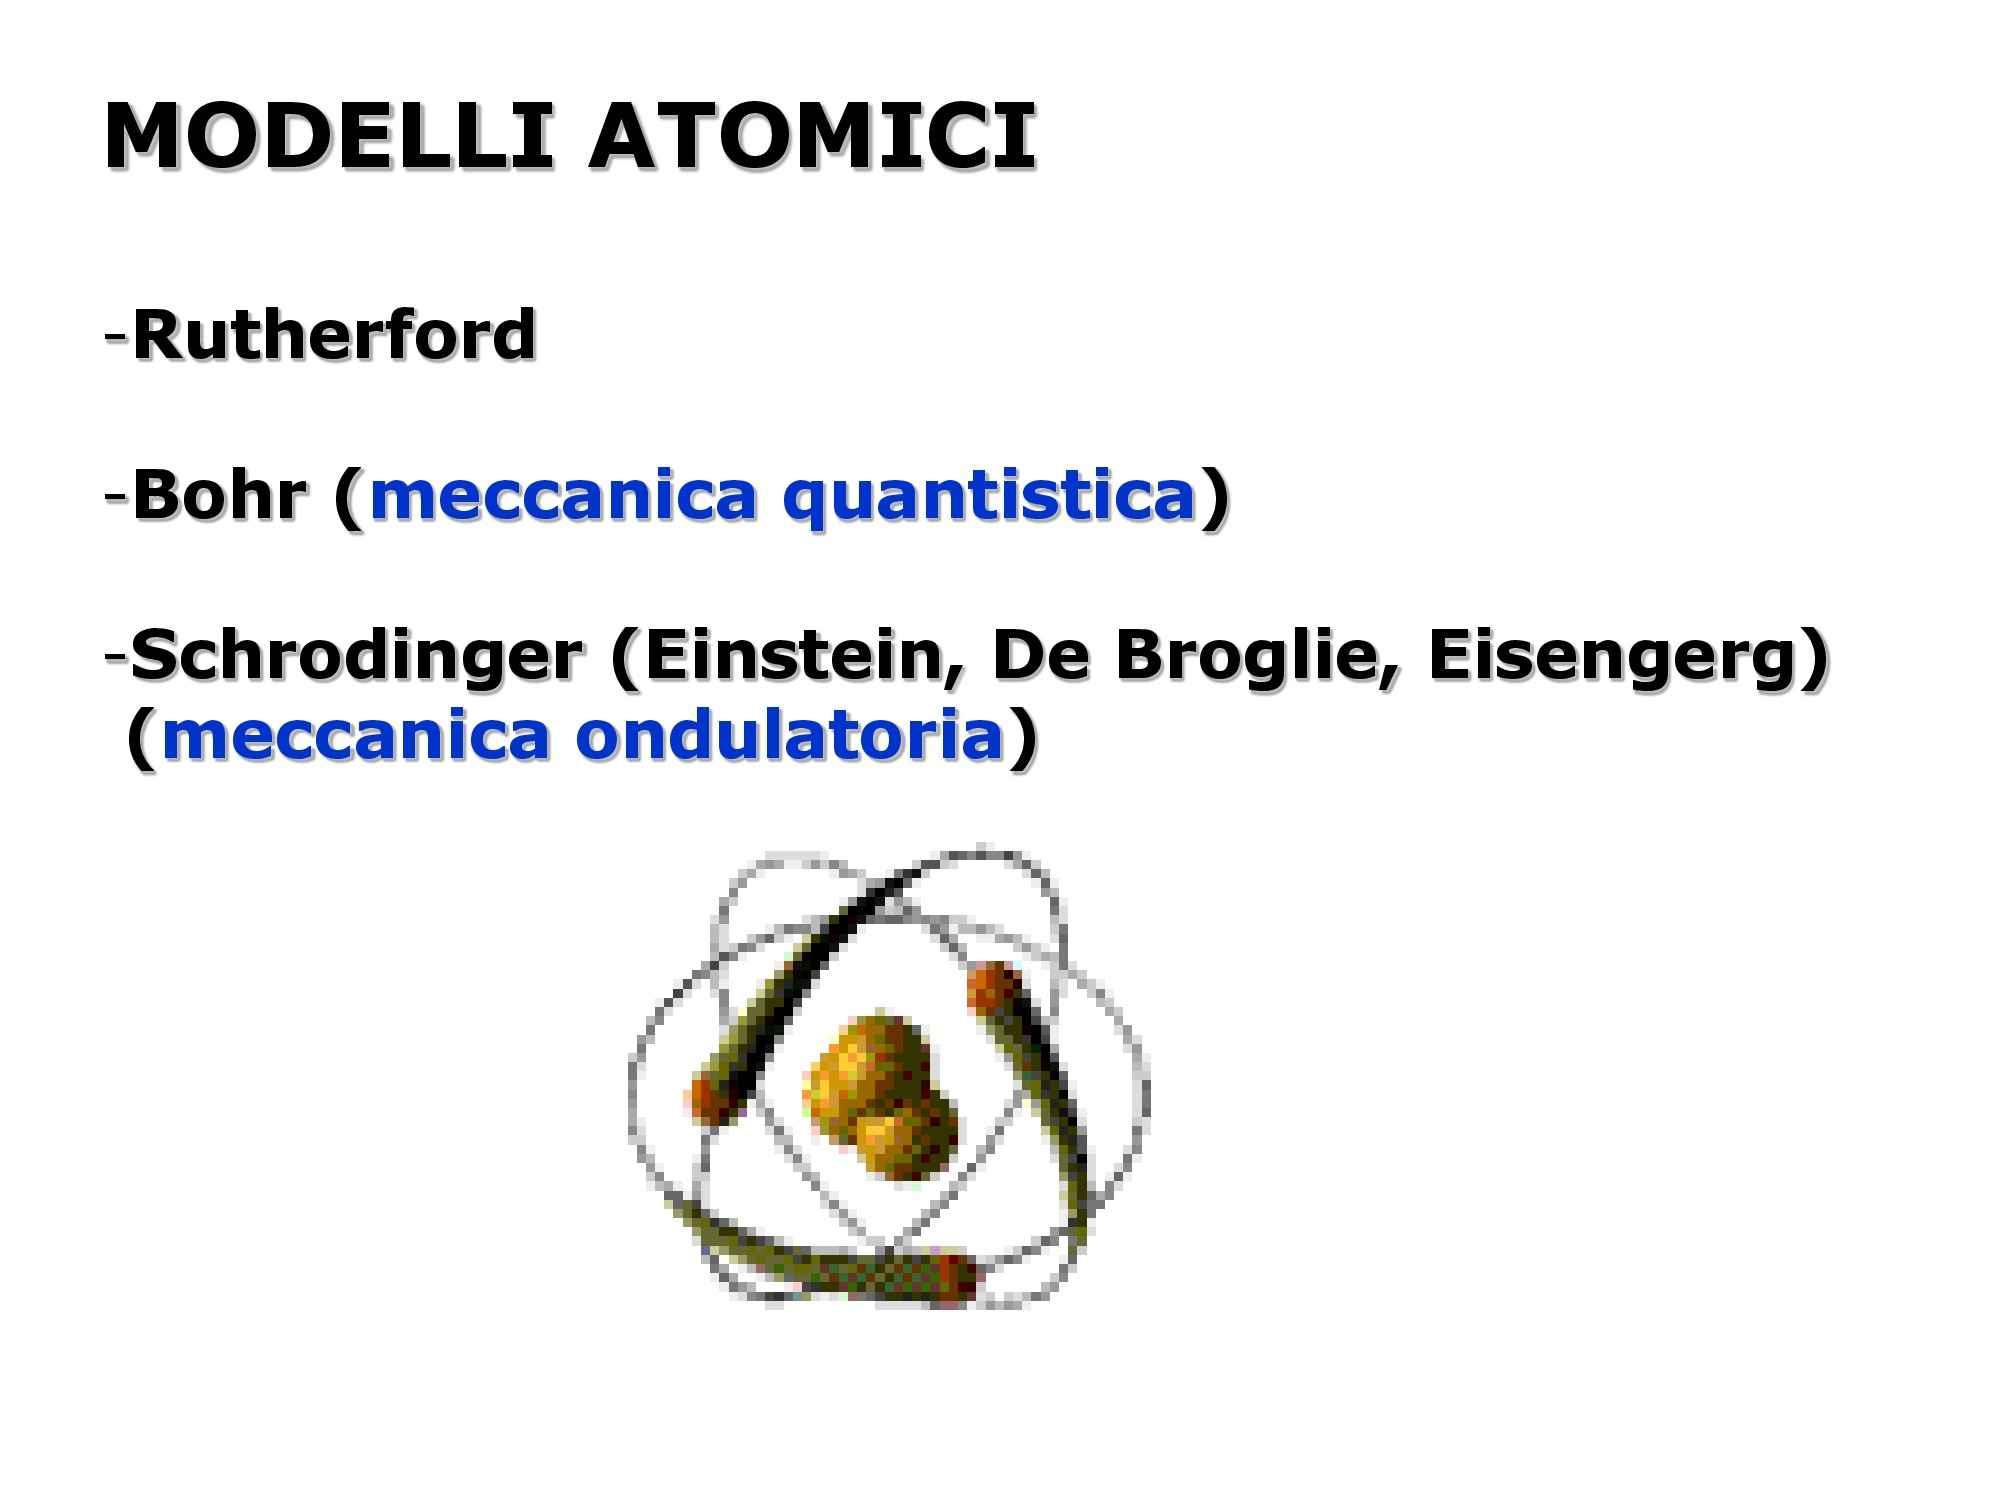 Modelli Atomici